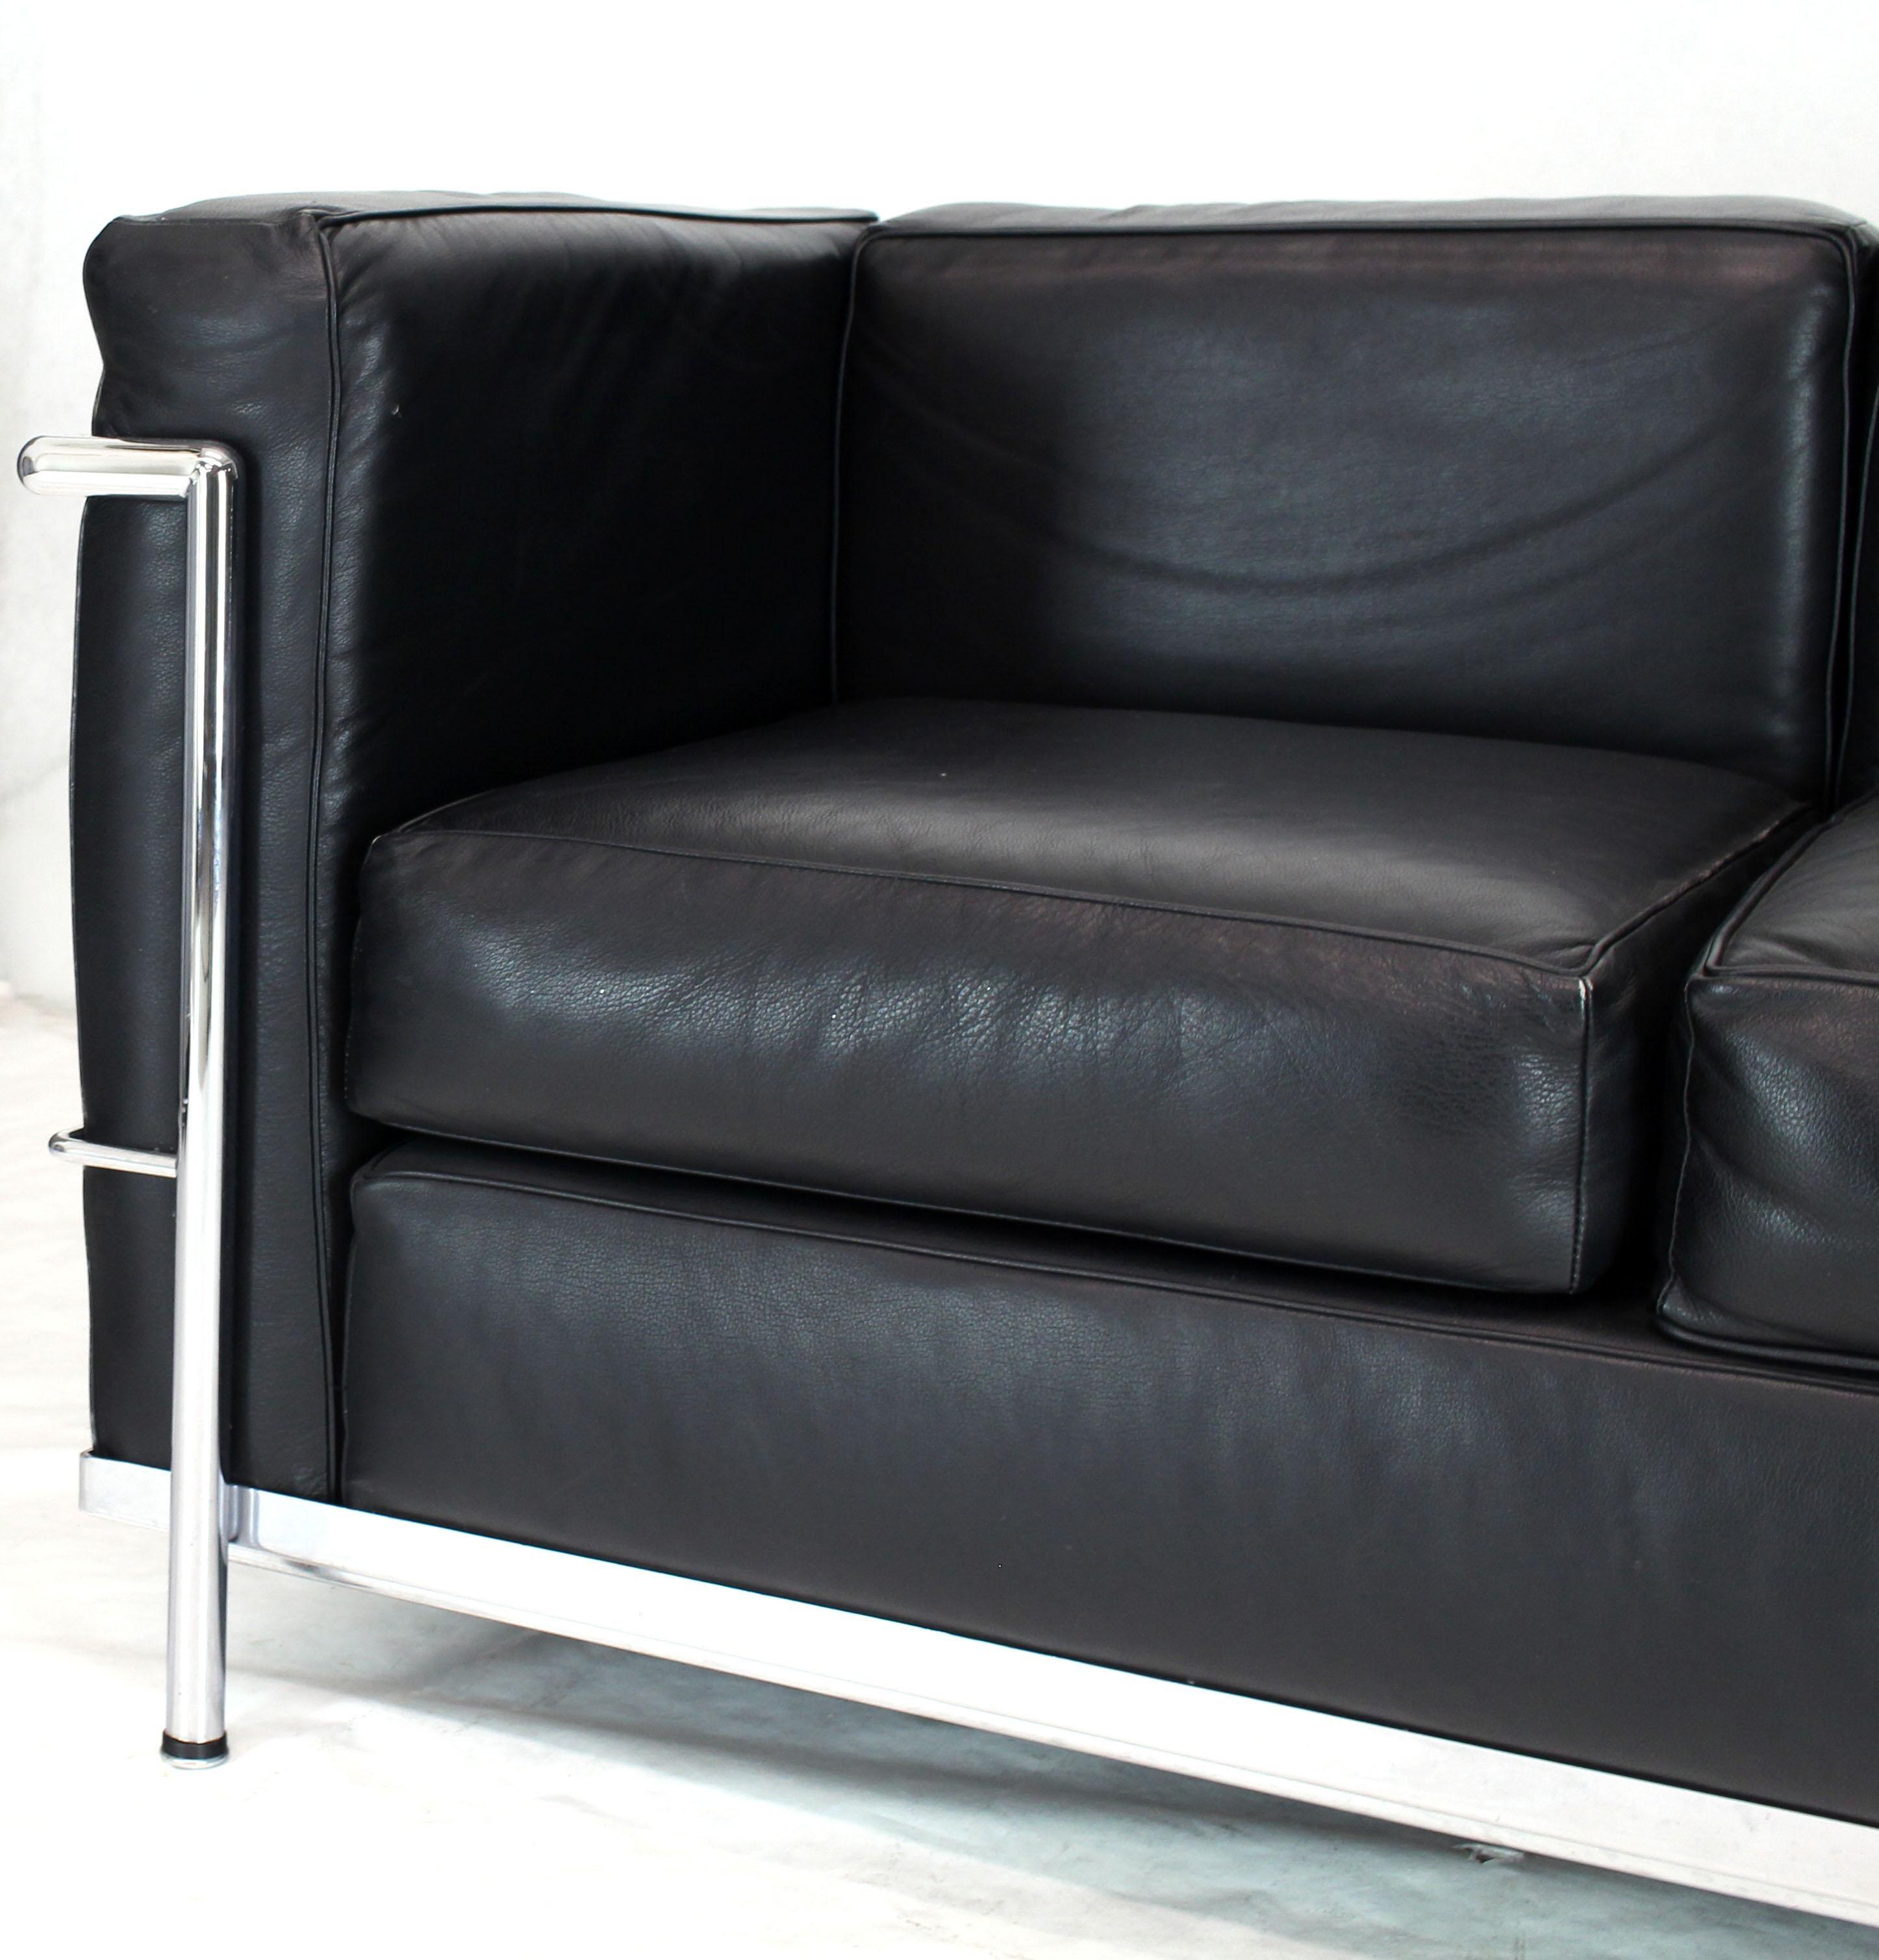 Licensed Edition Le Corbusier Sofa By Alivar. Alivar Was The First Licensed  Manufacturer Of Le